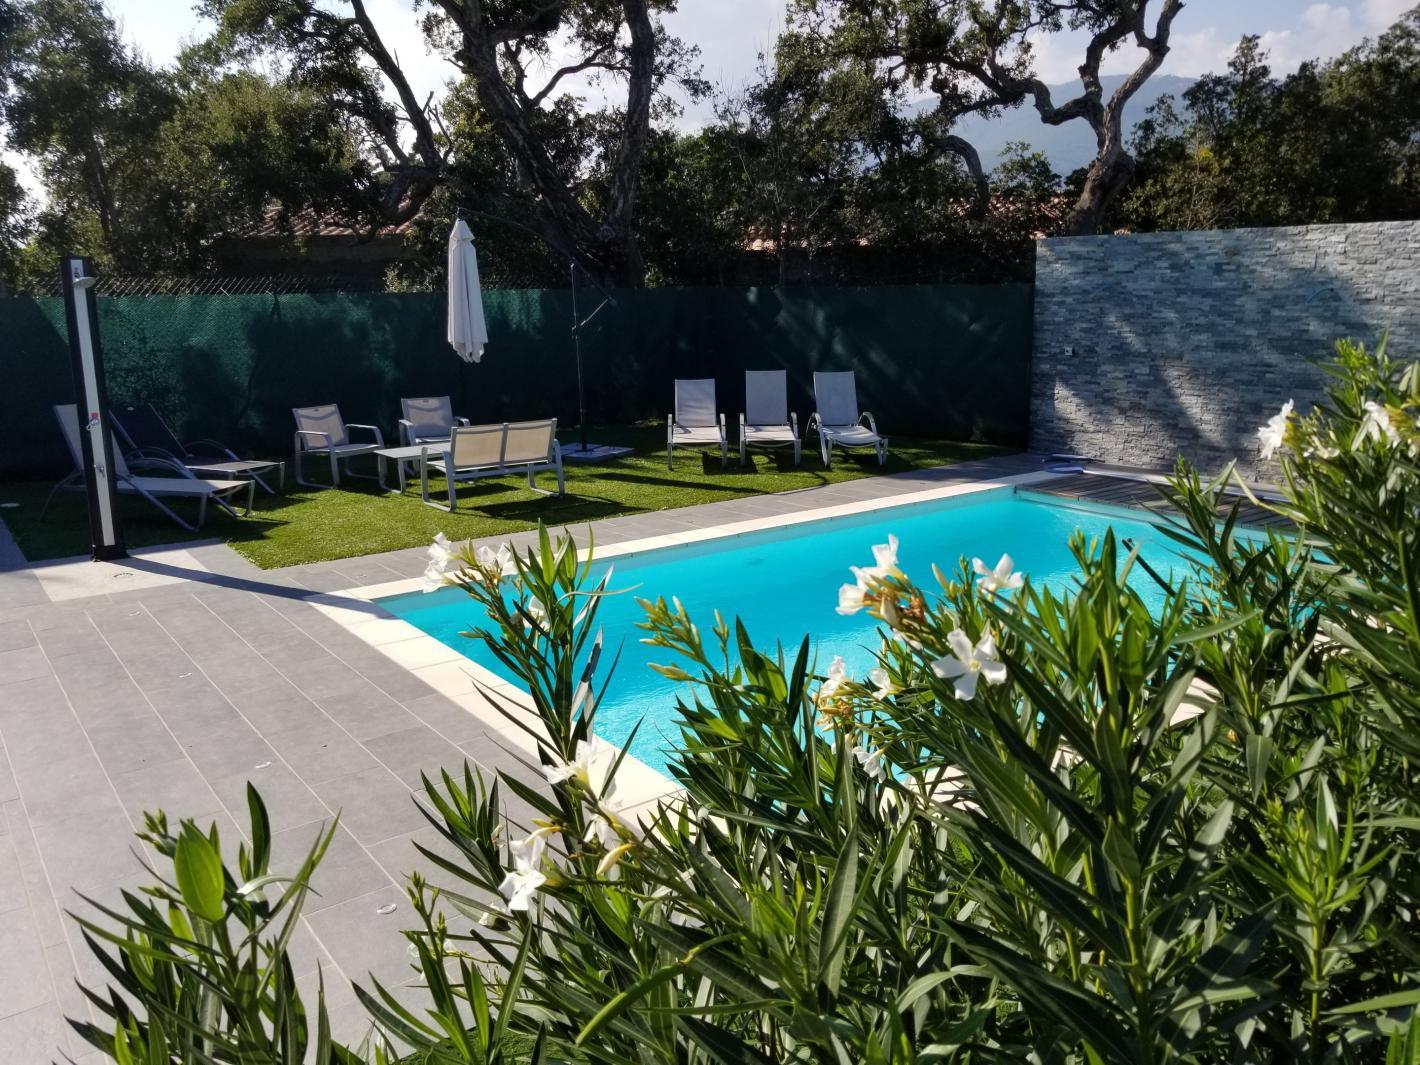 villa avec piscine priv e 10 mn plage saint cyprien porto vecchio. Black Bedroom Furniture Sets. Home Design Ideas